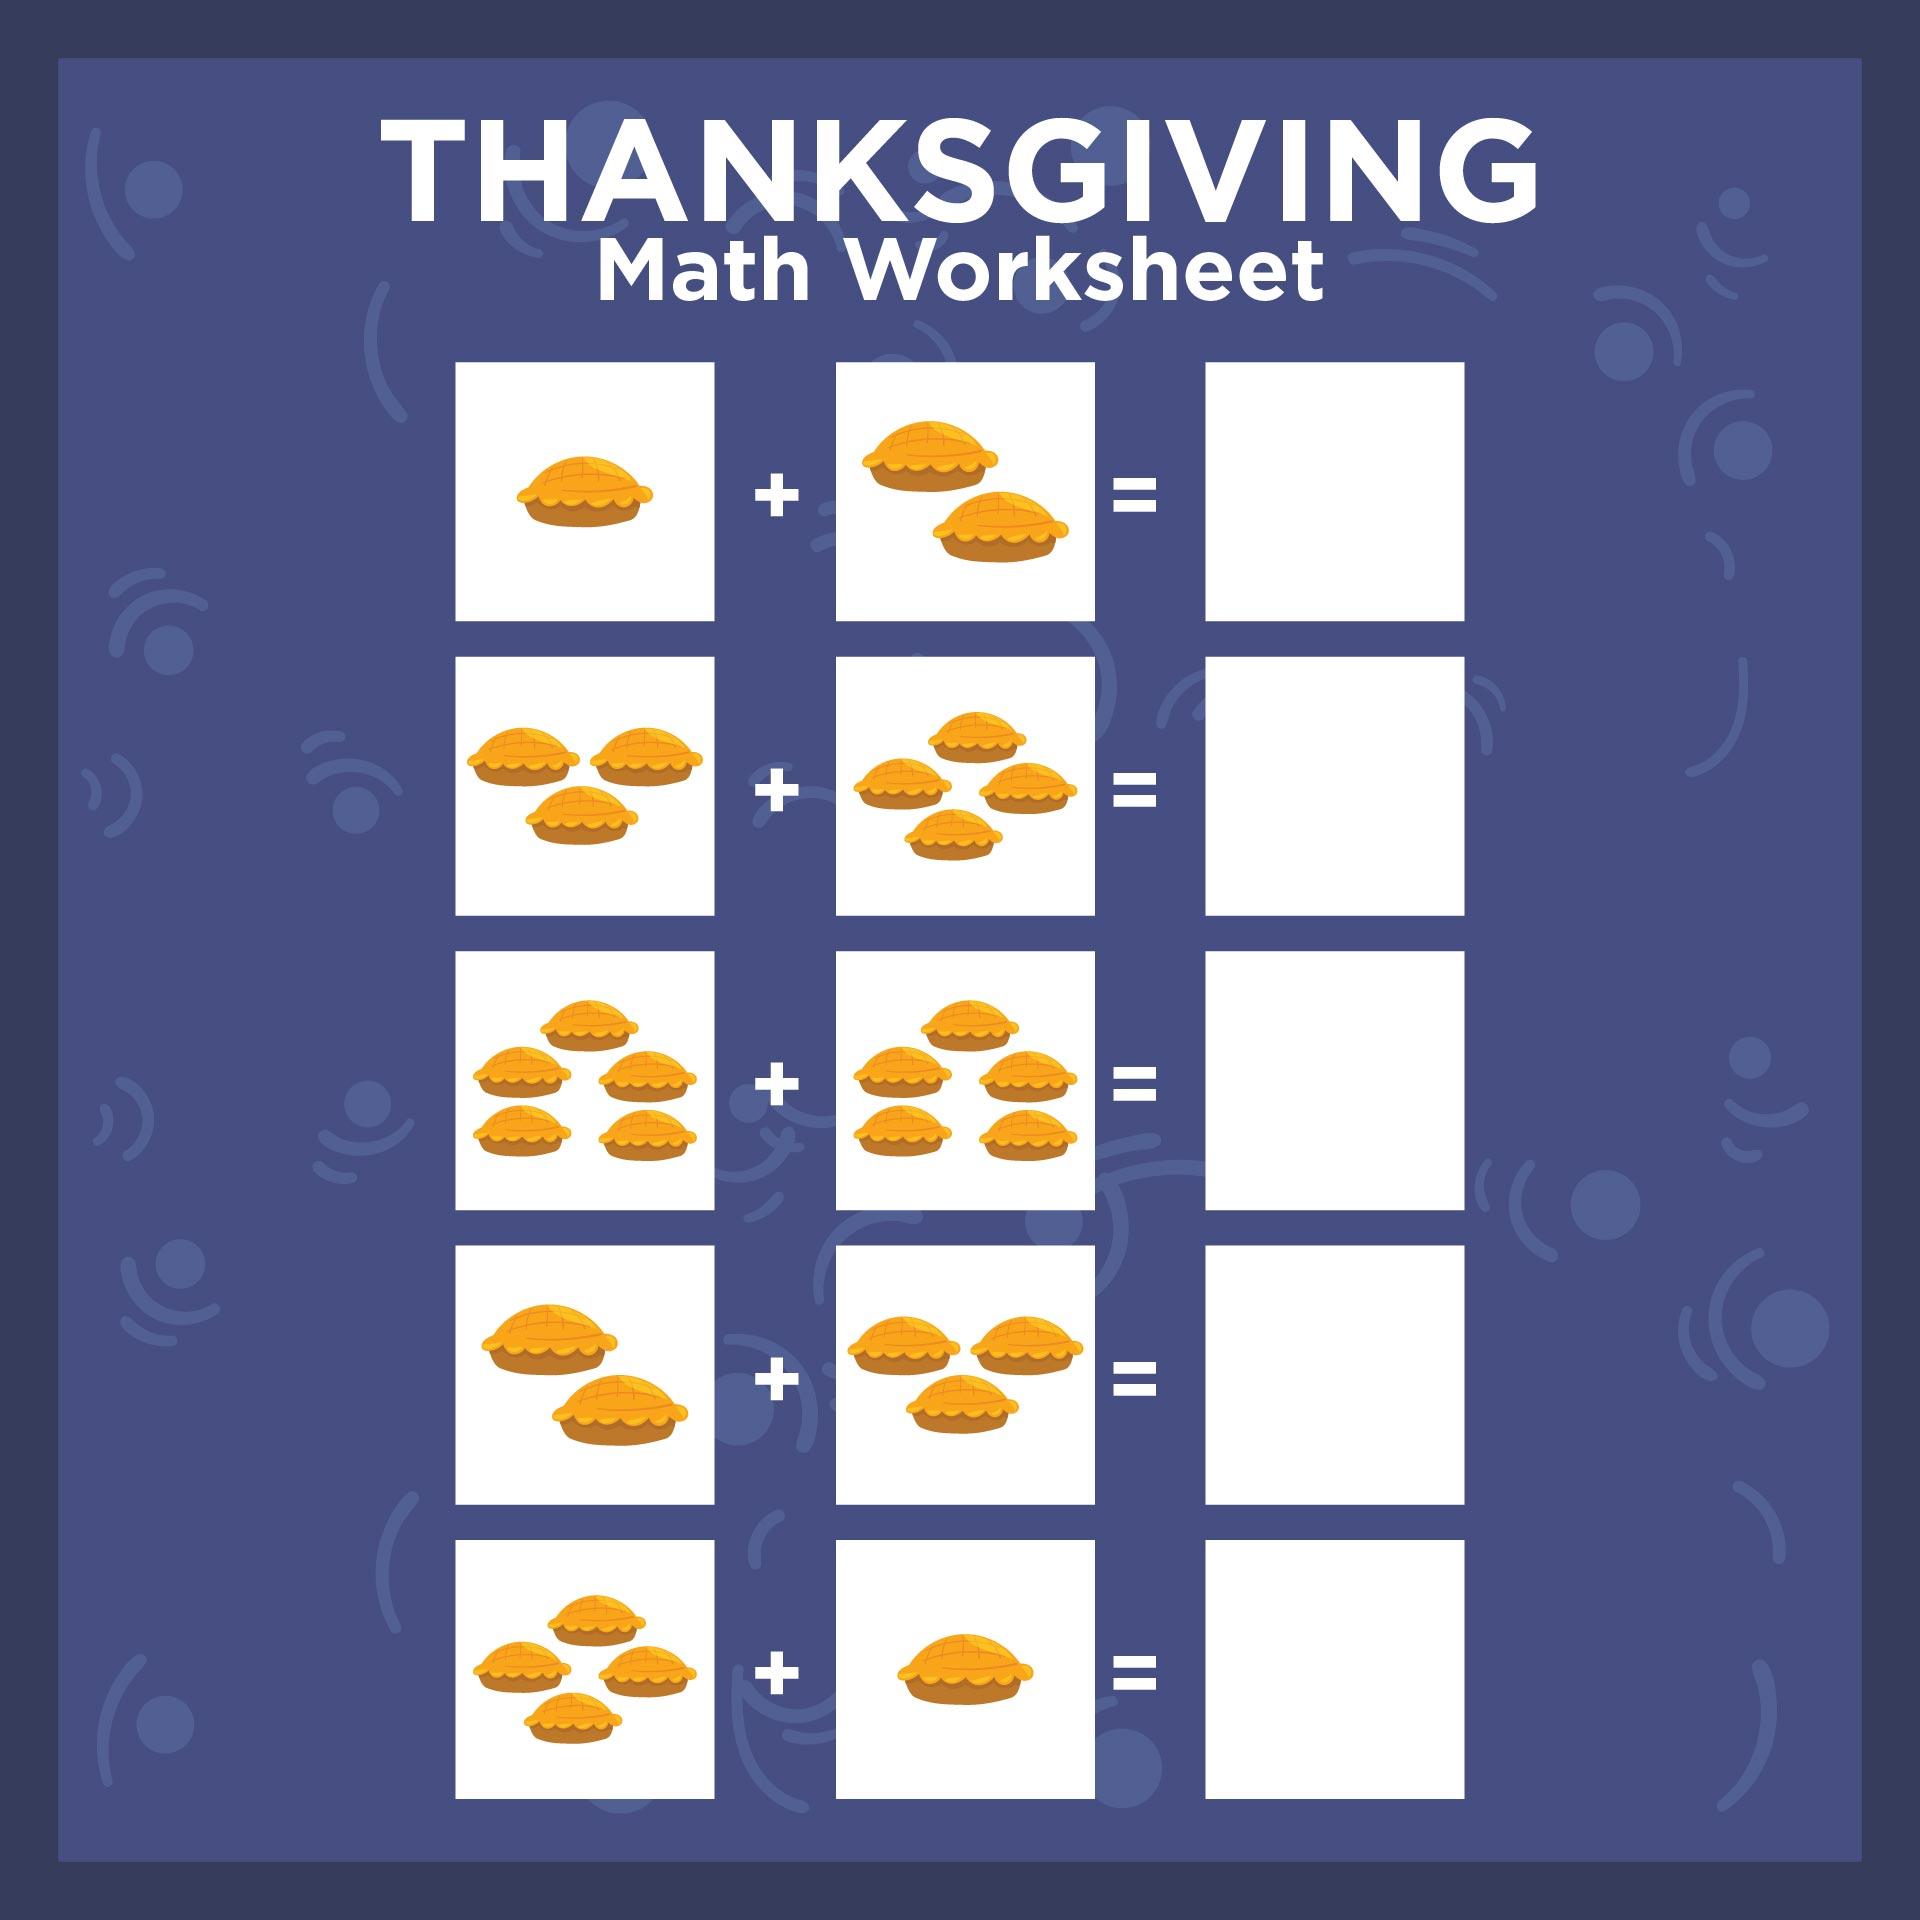 Thanksgiving Math Worksheets For Kindergarten